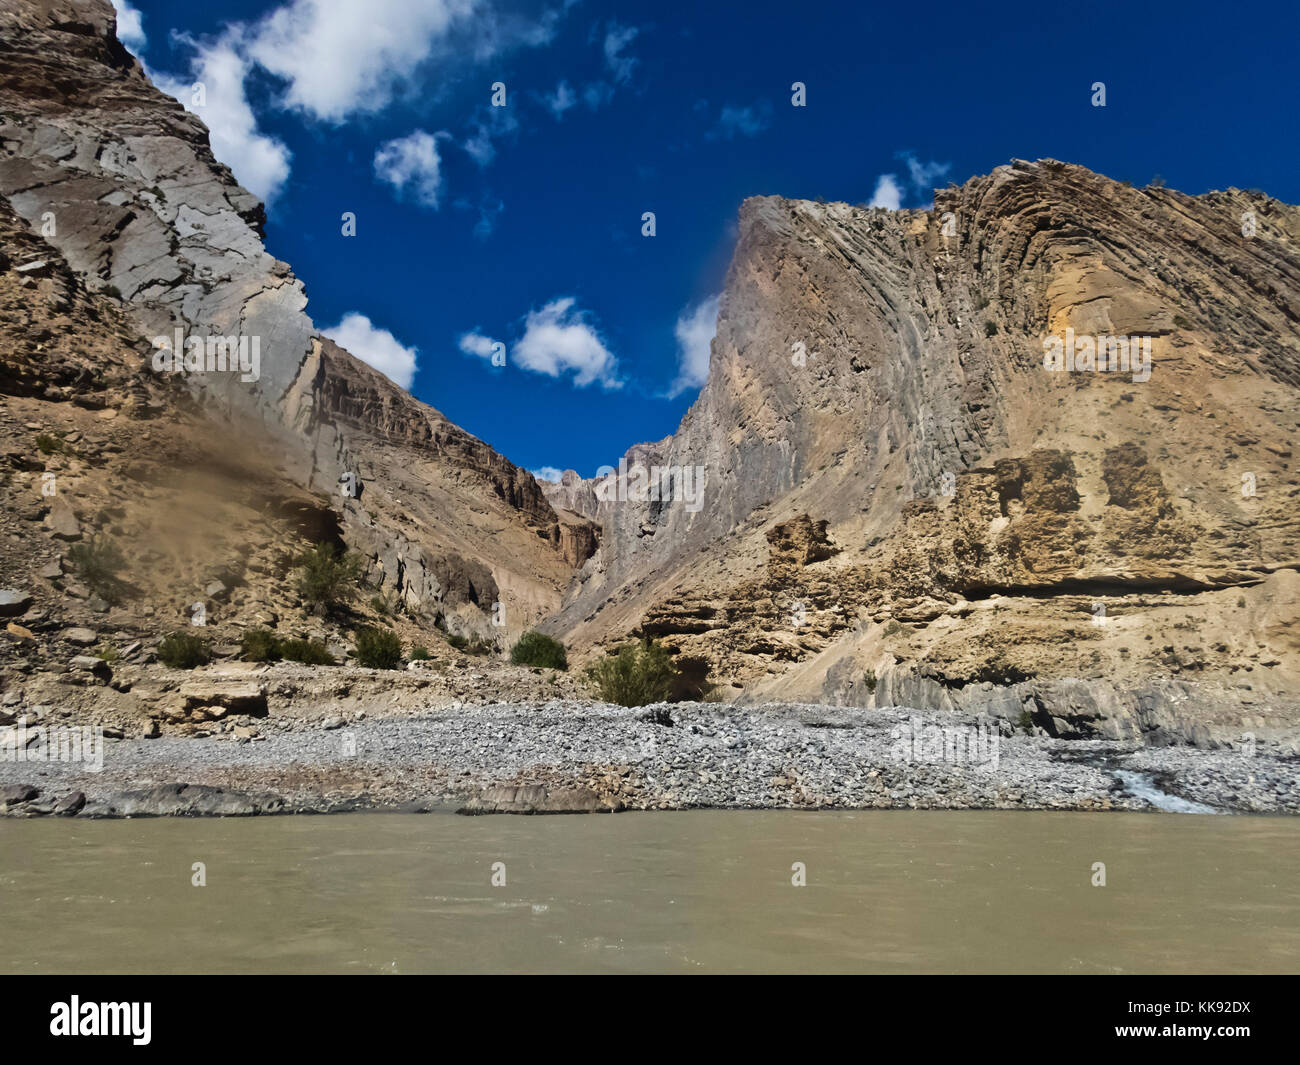 Geological rock formation rise above the STOD RIVER - ZANSKAR, LADAKH, INDIA - Stock Image